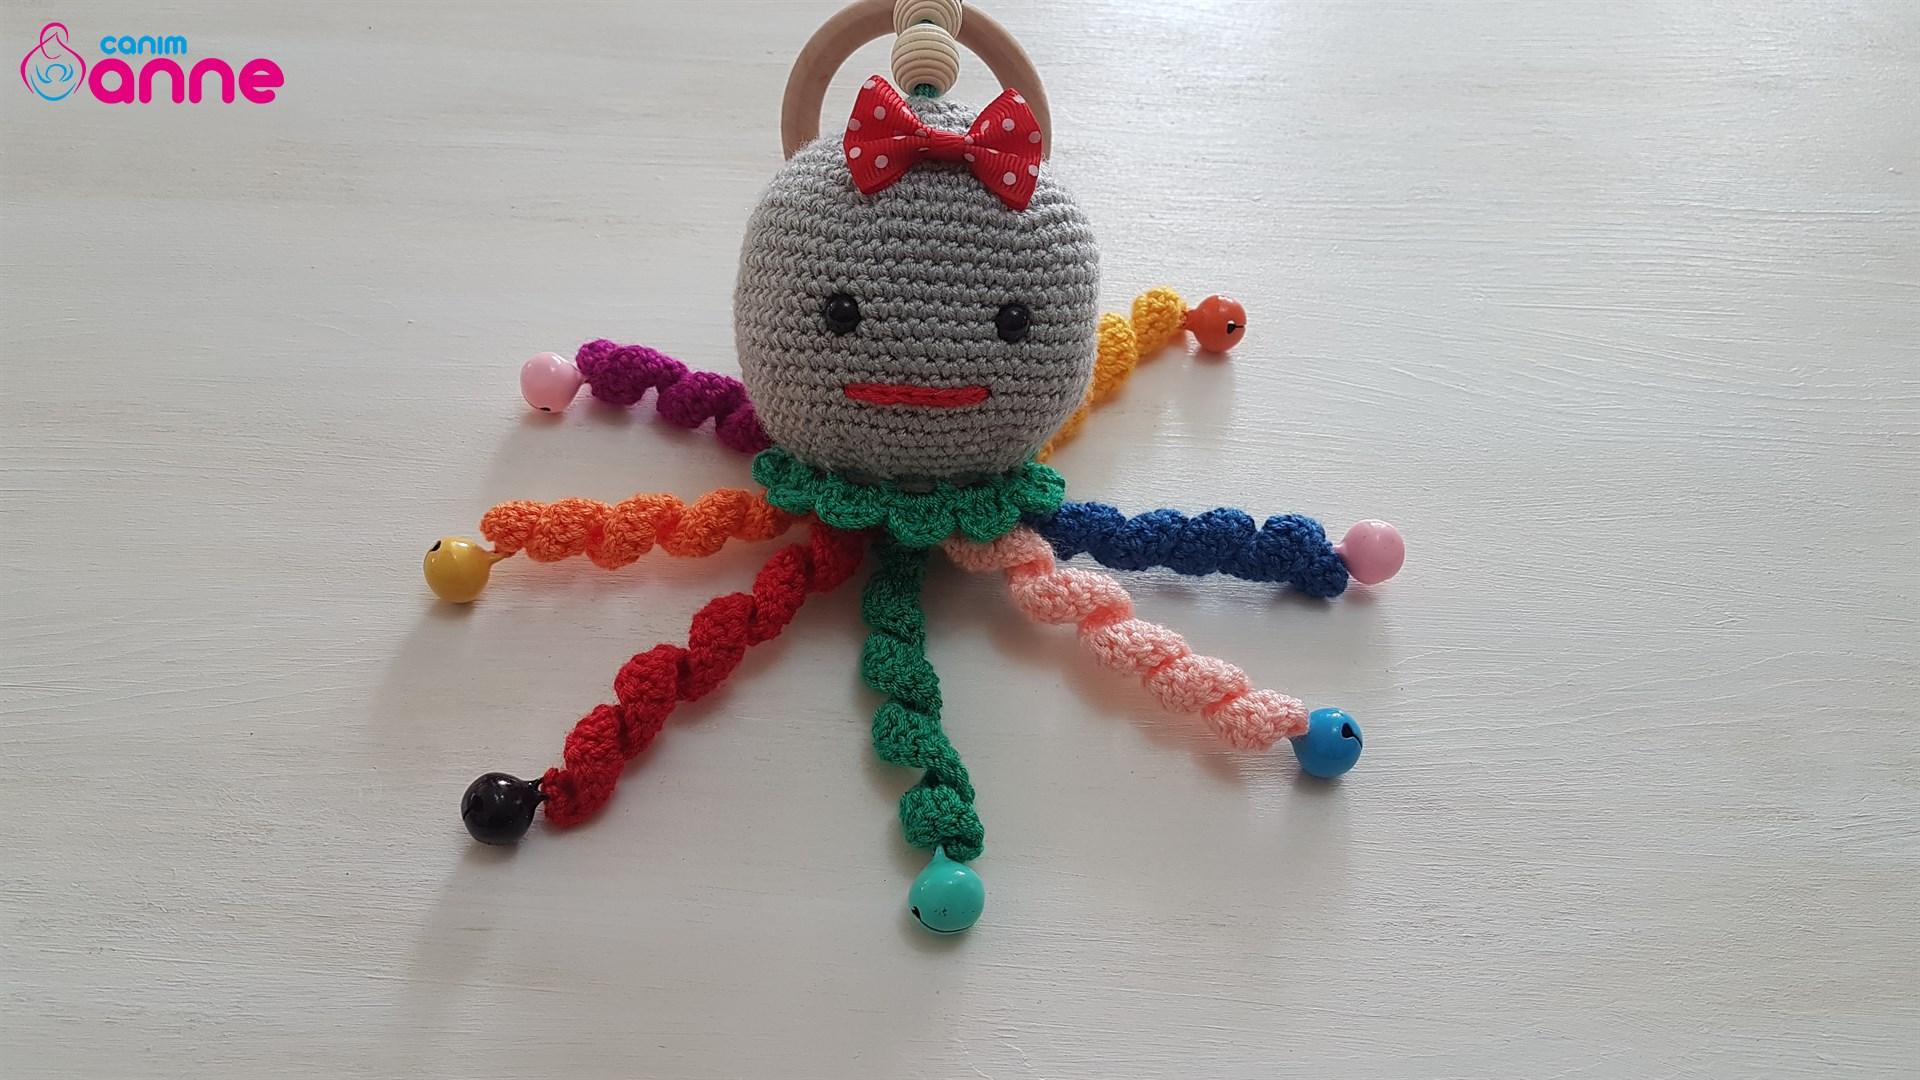 Amigurumi Octopus Baby Toy Free Pattern - thefriendlyredfox.com | 1080x1920